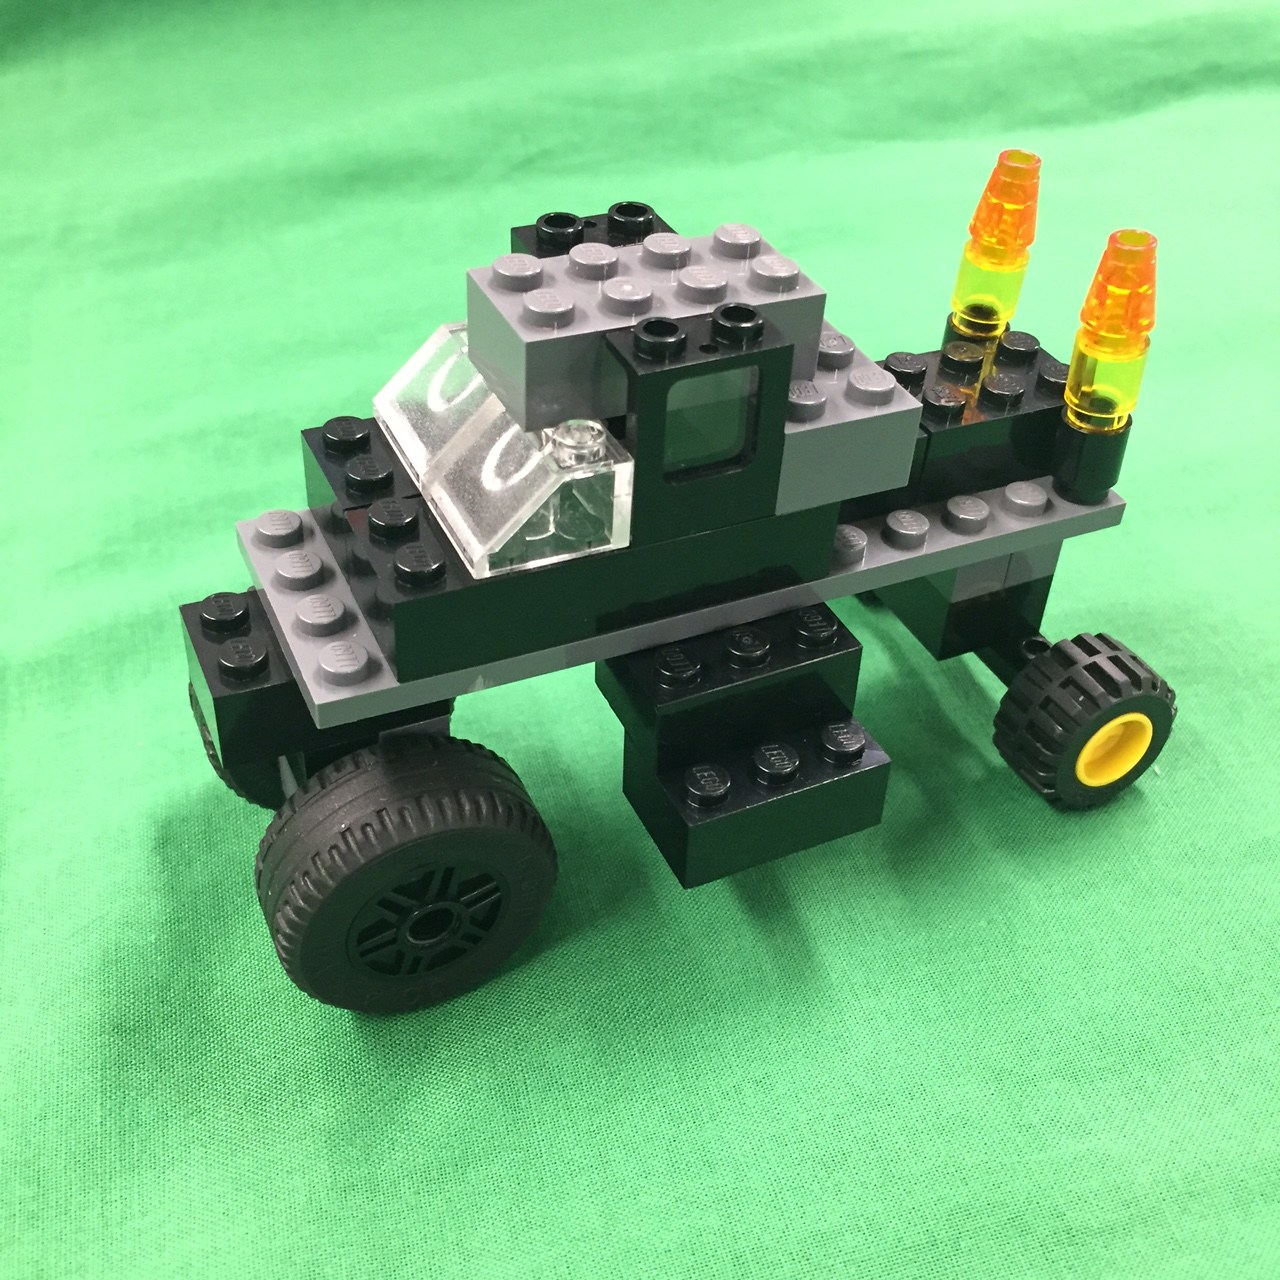 Student Build 8.25.17